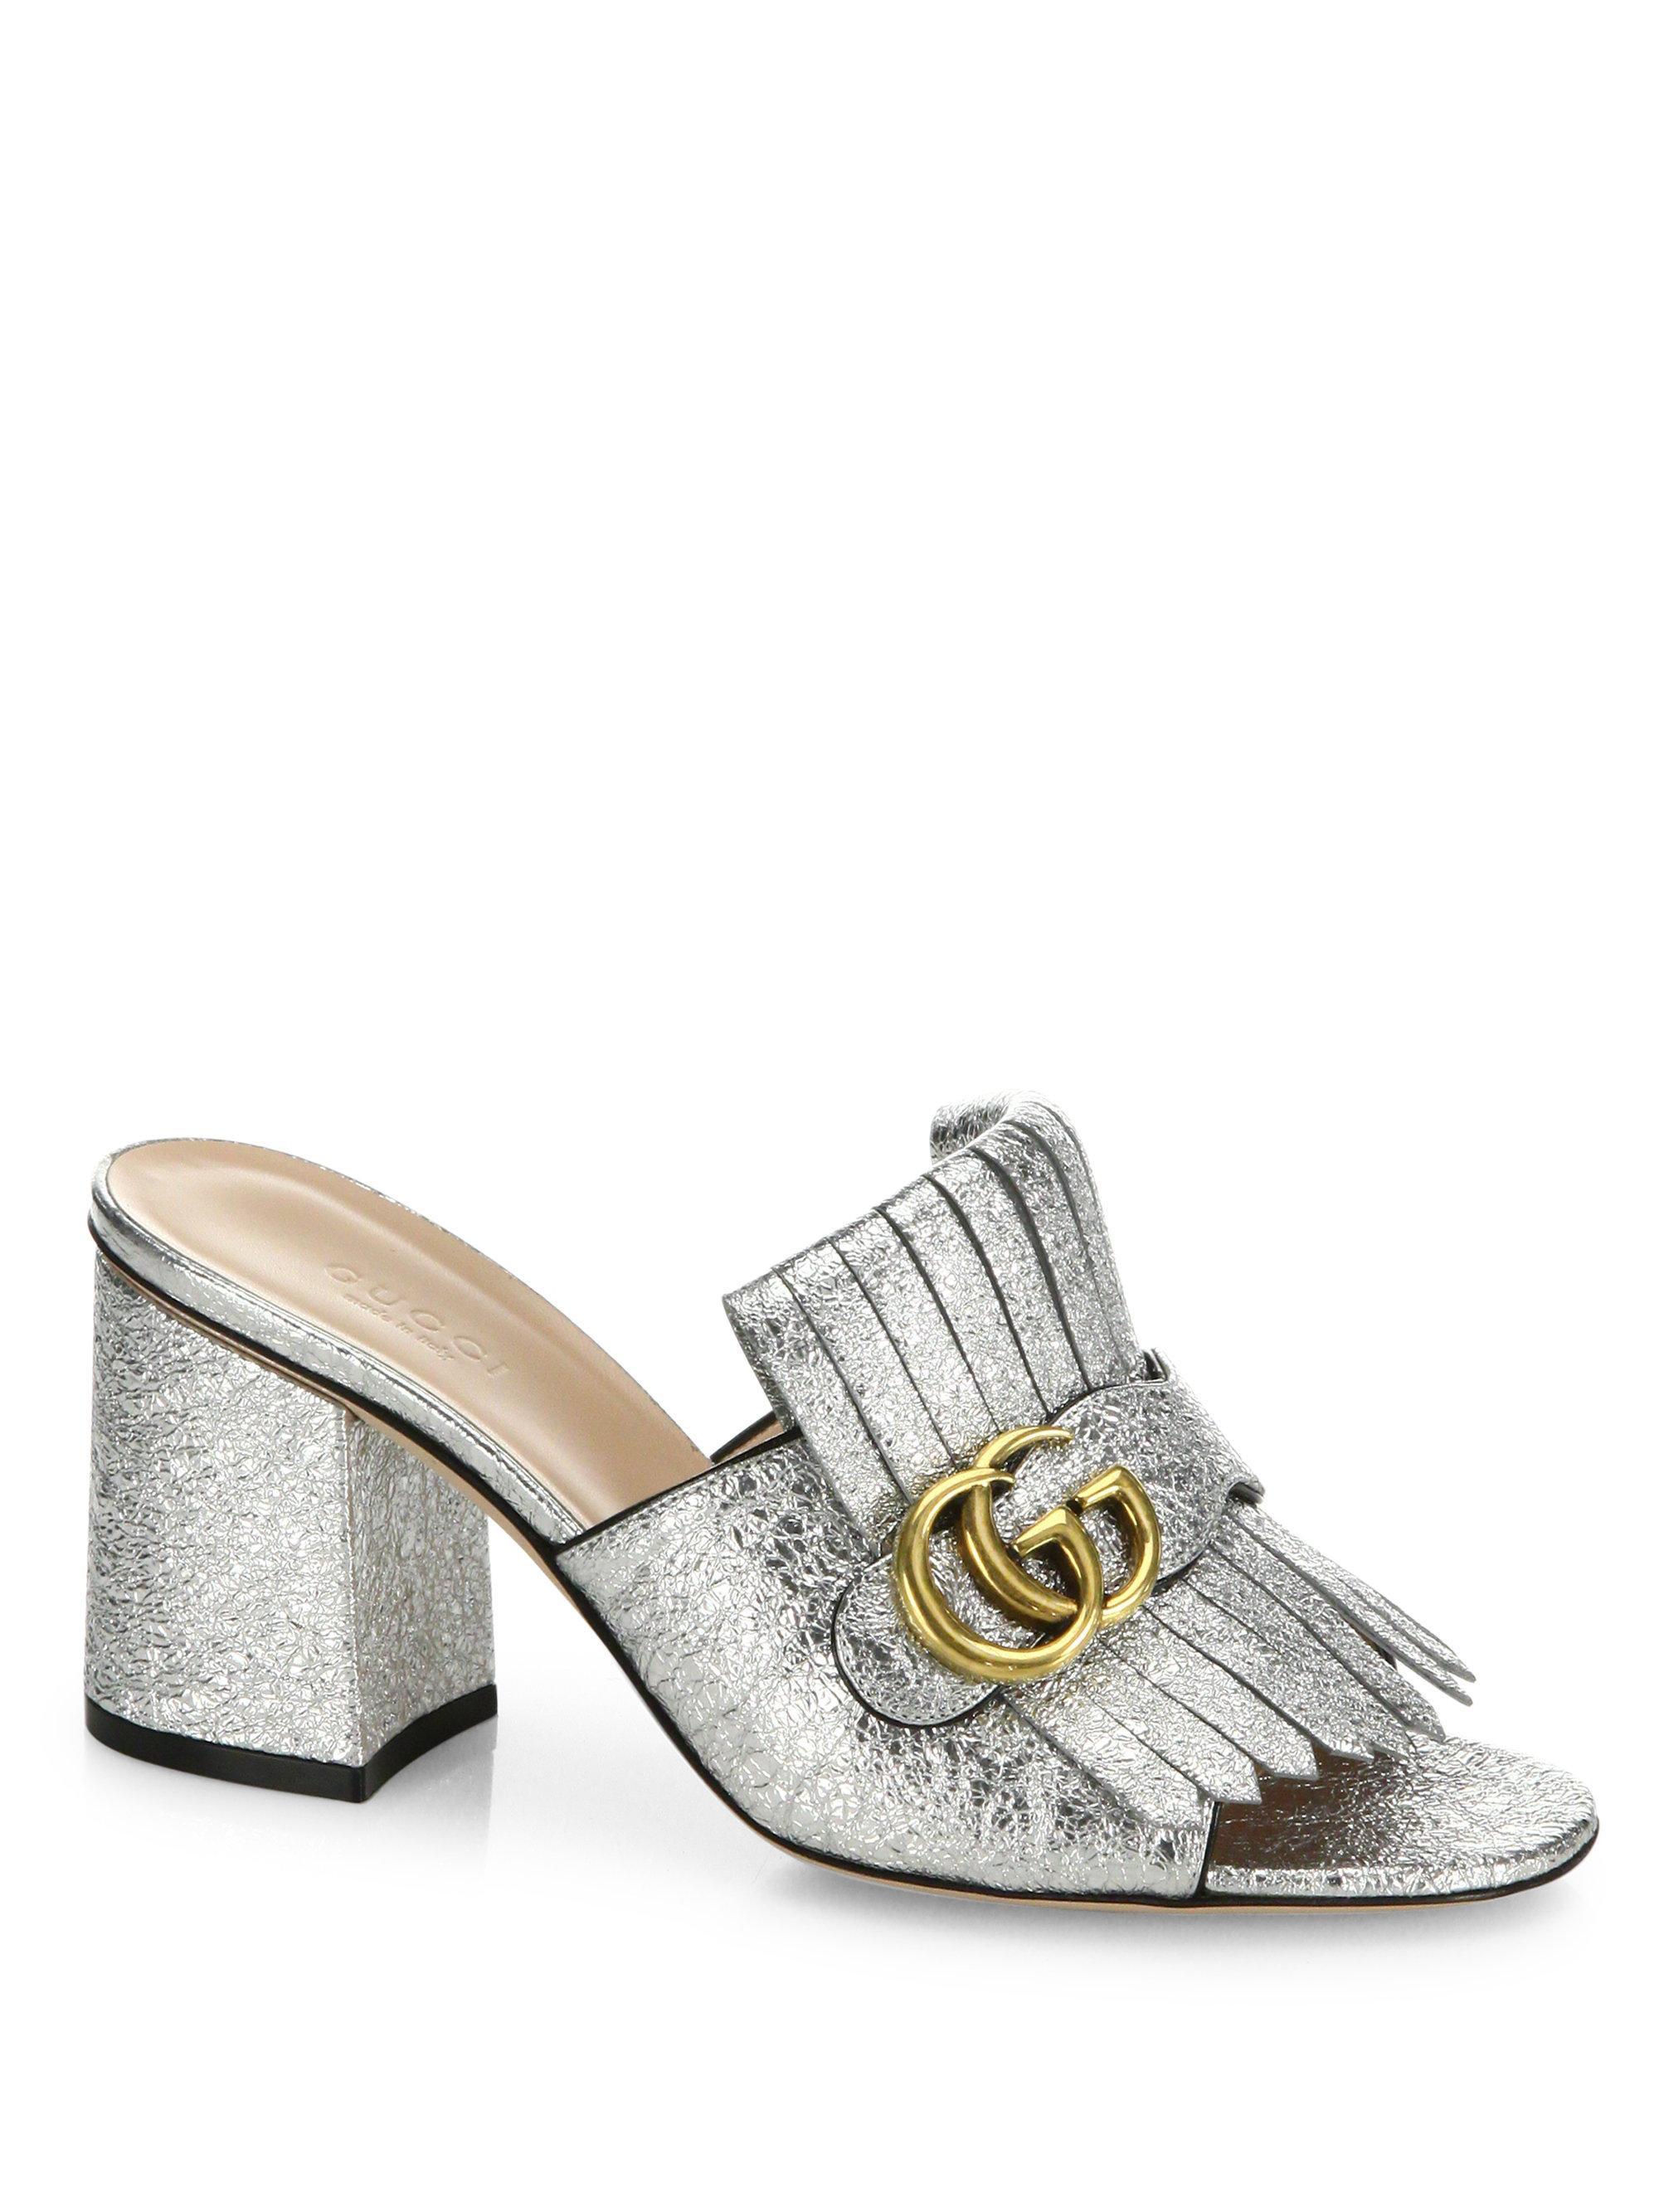 Lyst Gucci Marmont Gg Kiltie Metallic Leather Block Heel